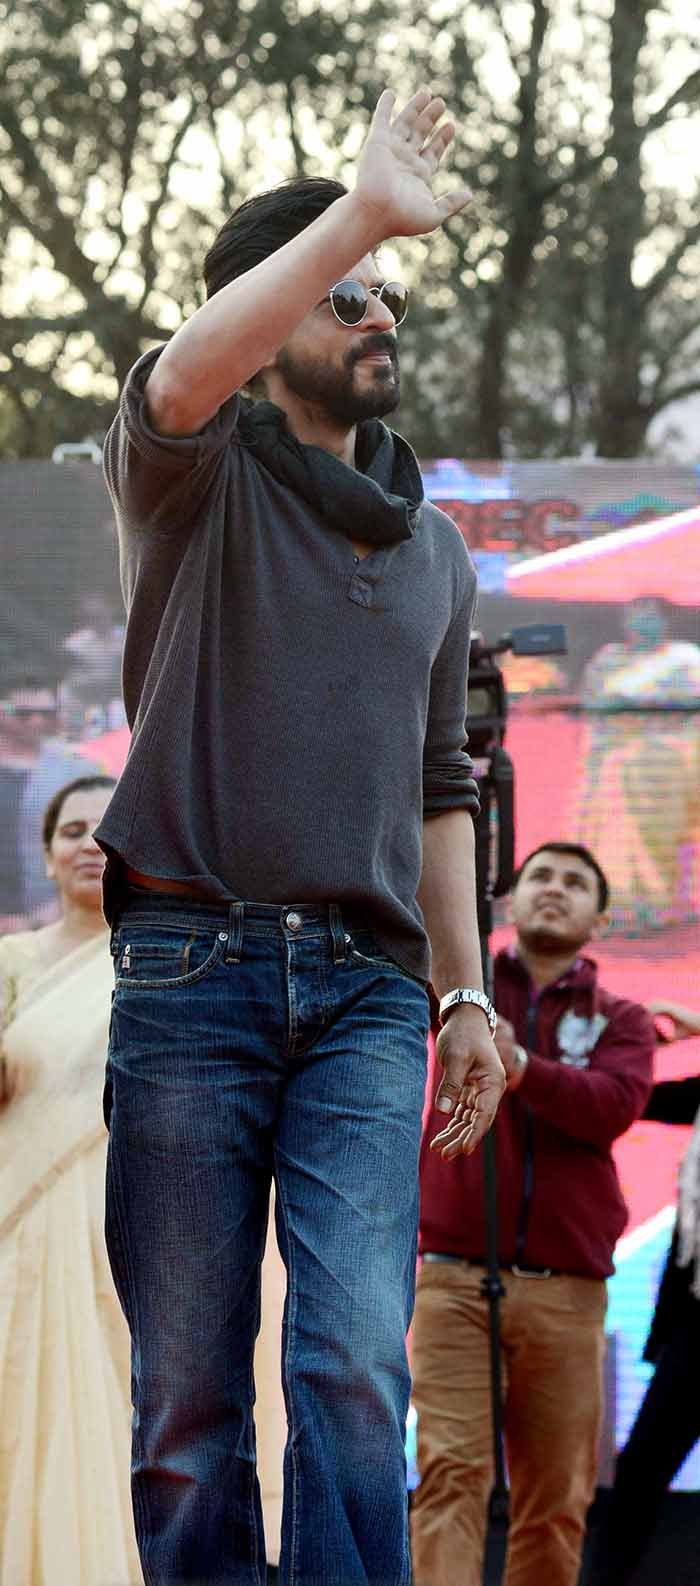 Shahrukh Khan Promotes Film Fan at Hans Raj College in Delhi-02